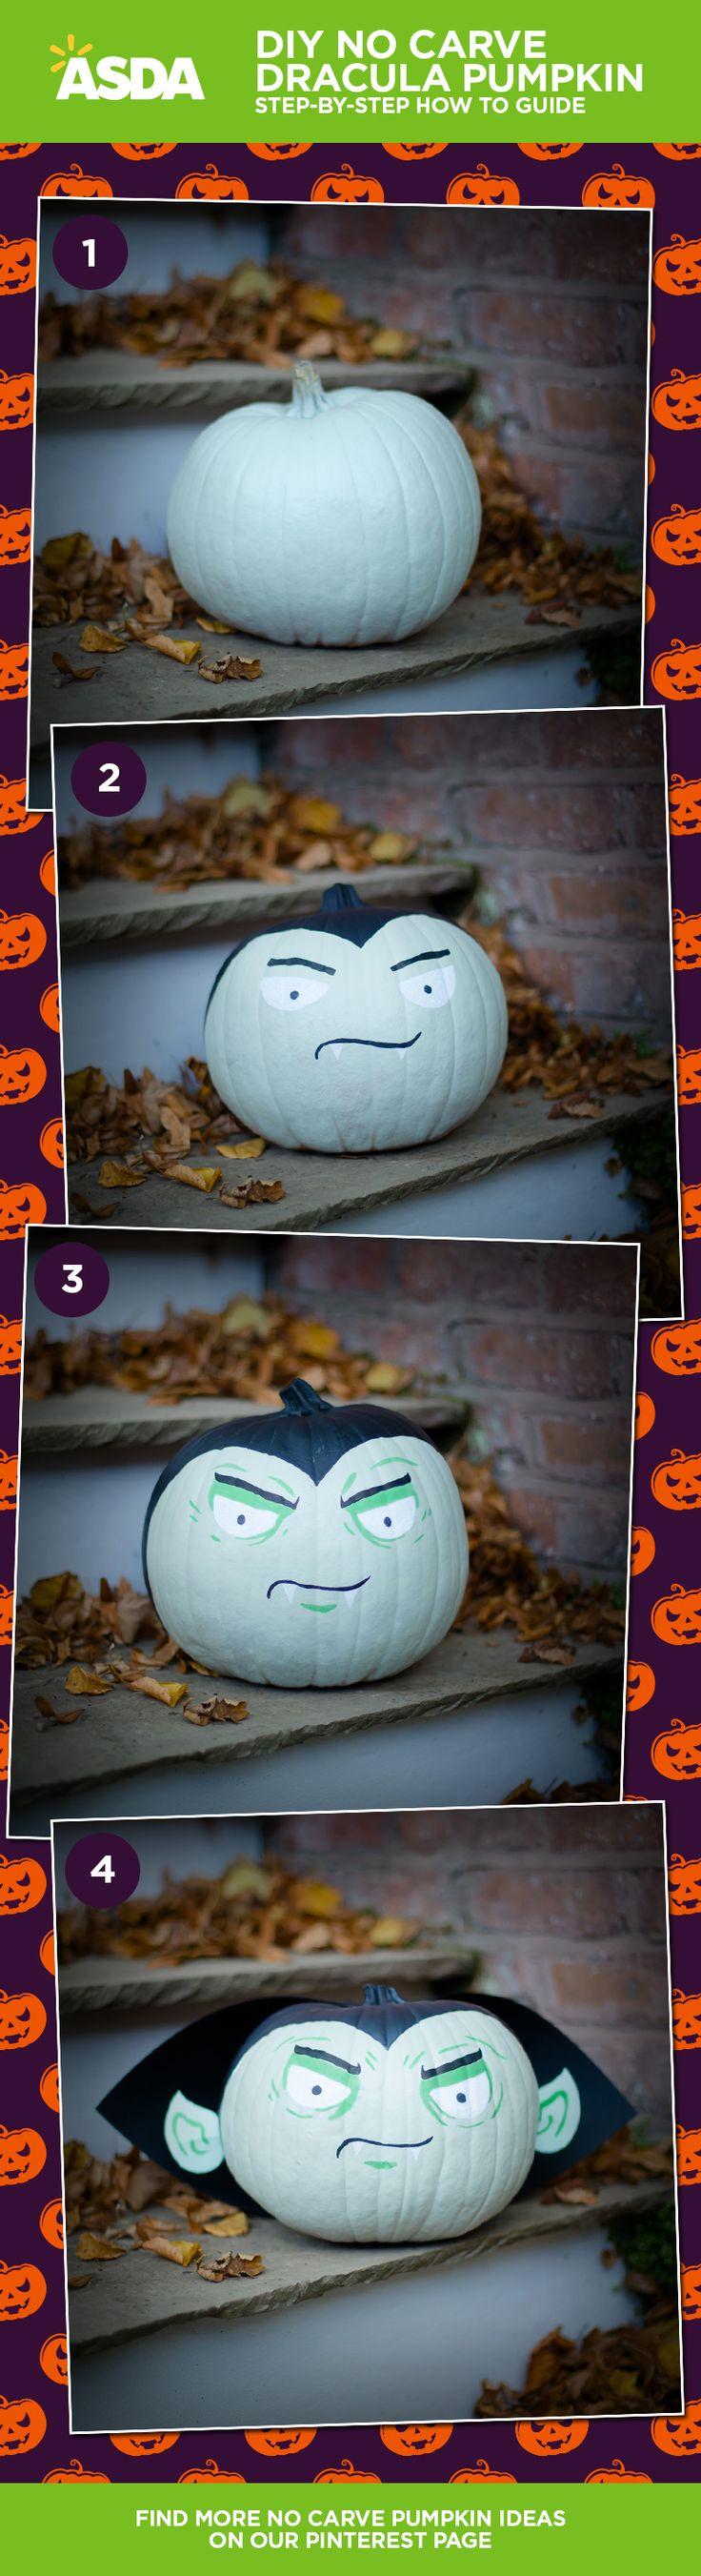 55 best Asda   Halloween Party images on Pinterest   Halloween ...